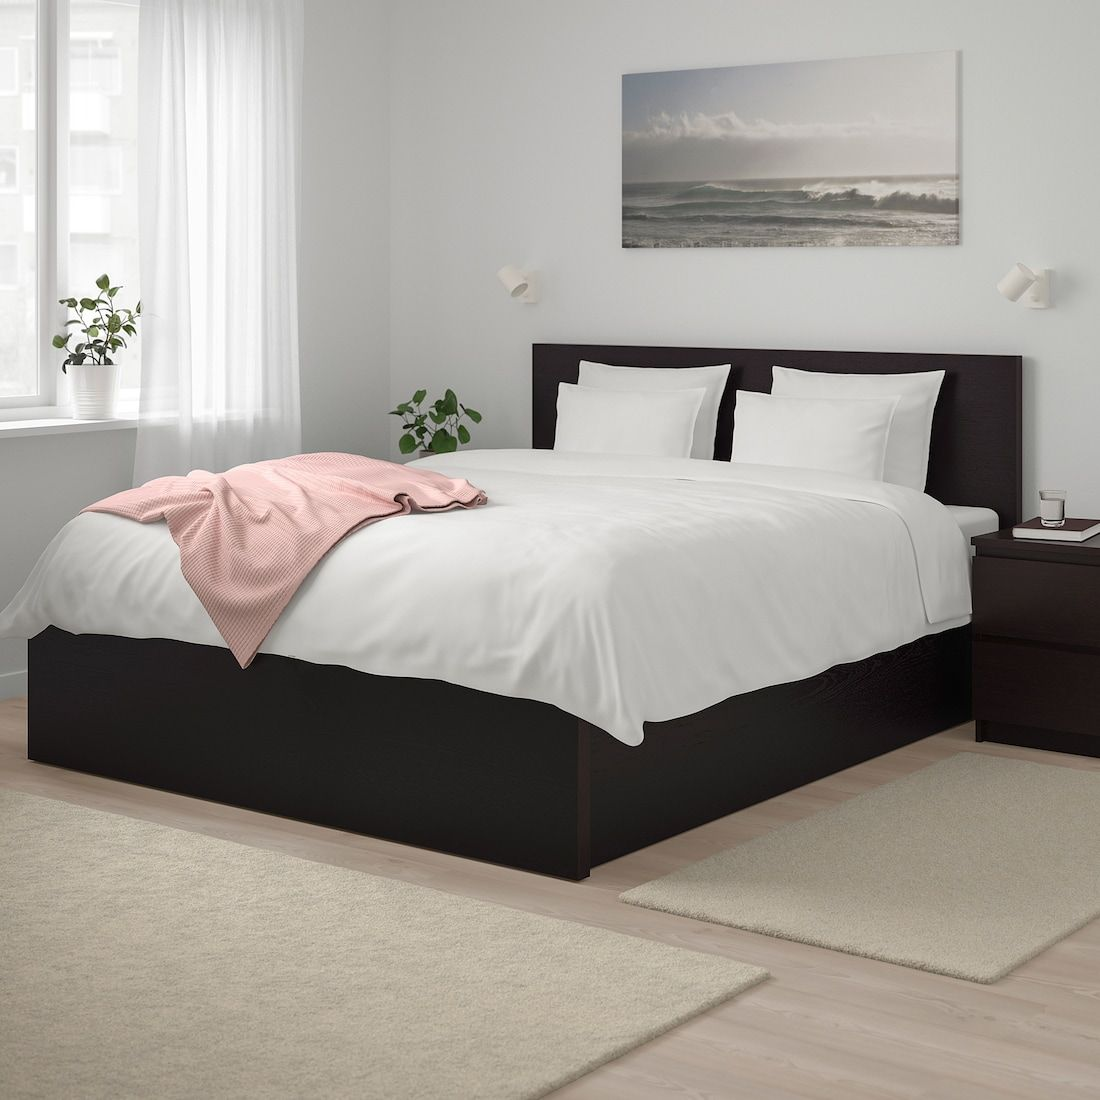 Malm Storage Bed Black Brown Queen Ikea Brown Furniture Bedroom Black Bedding Storage Bed